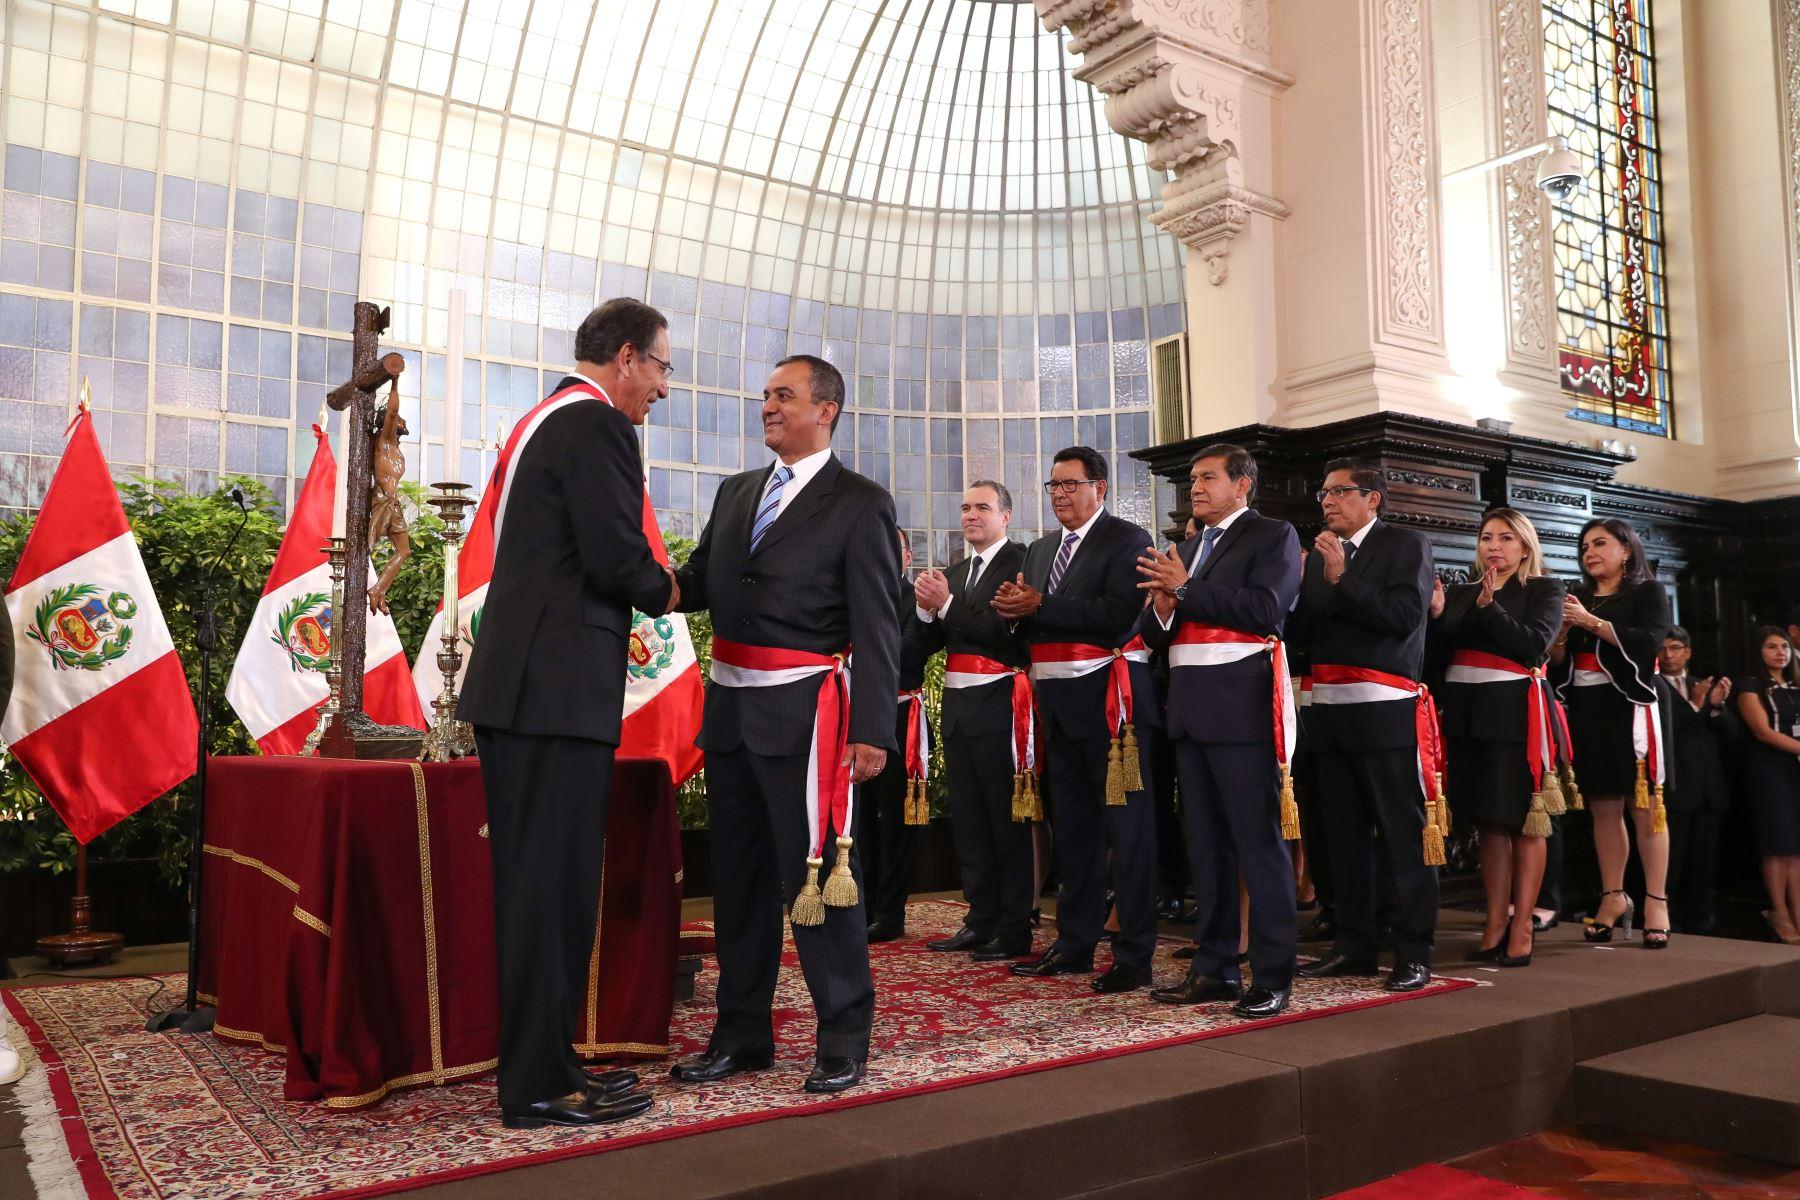 Carlos Oliva juramenta como ministro de Economía. Foto: ANDINA/Prensa Presidencia